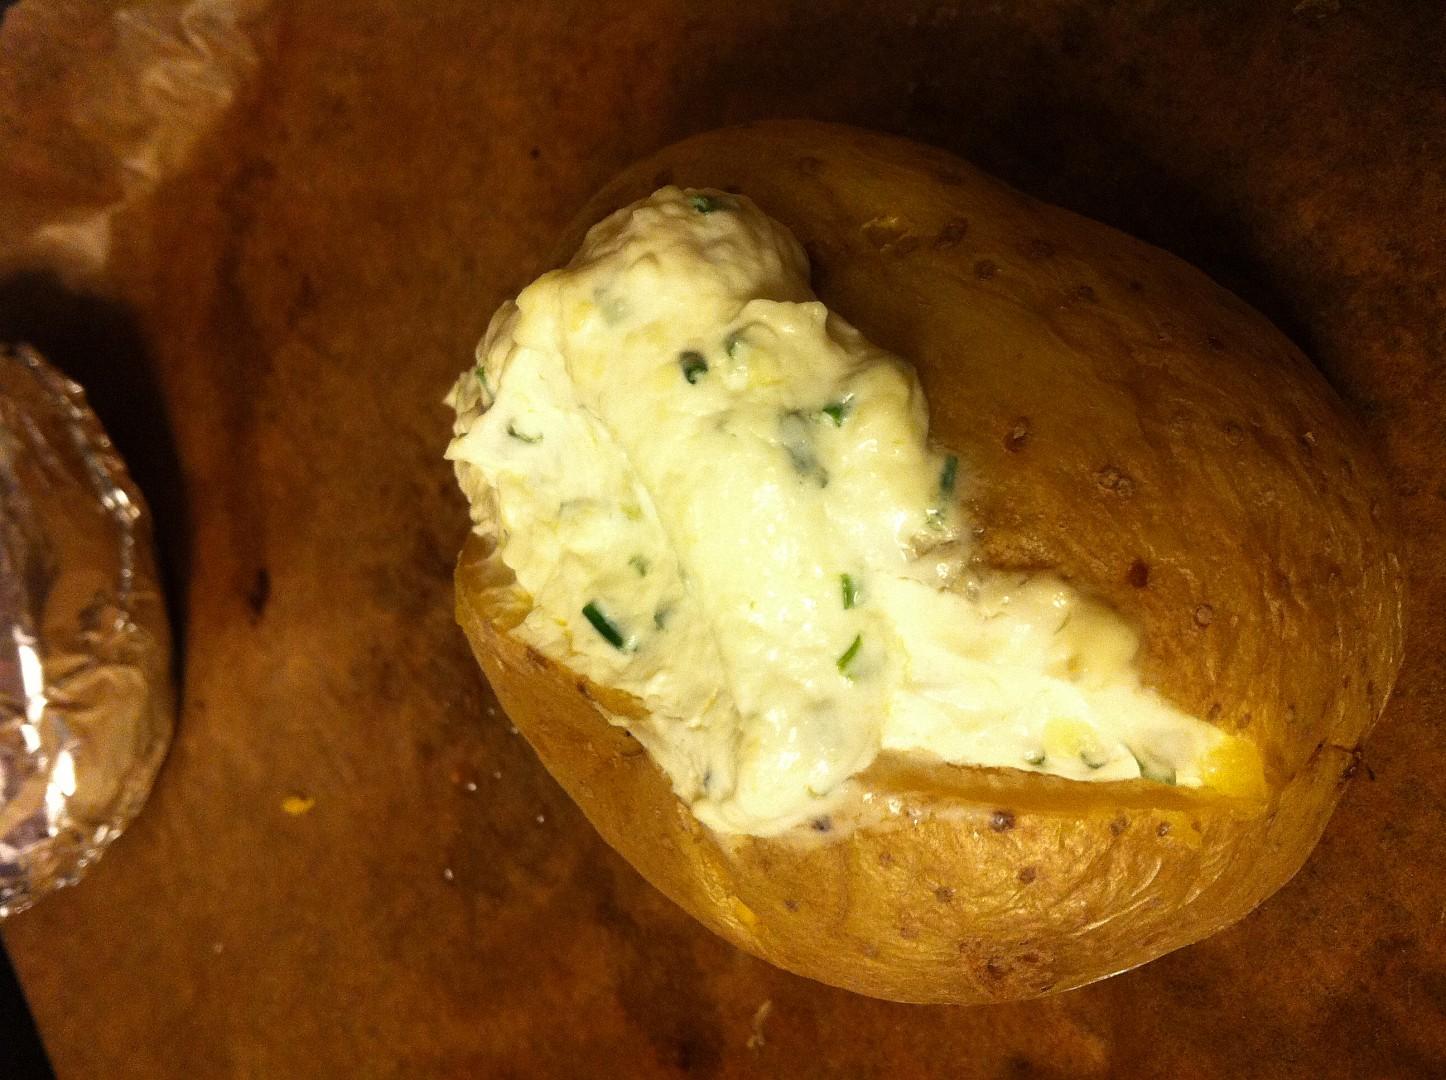 Pečená brambora v alobalu s tvarohem a pažitkou